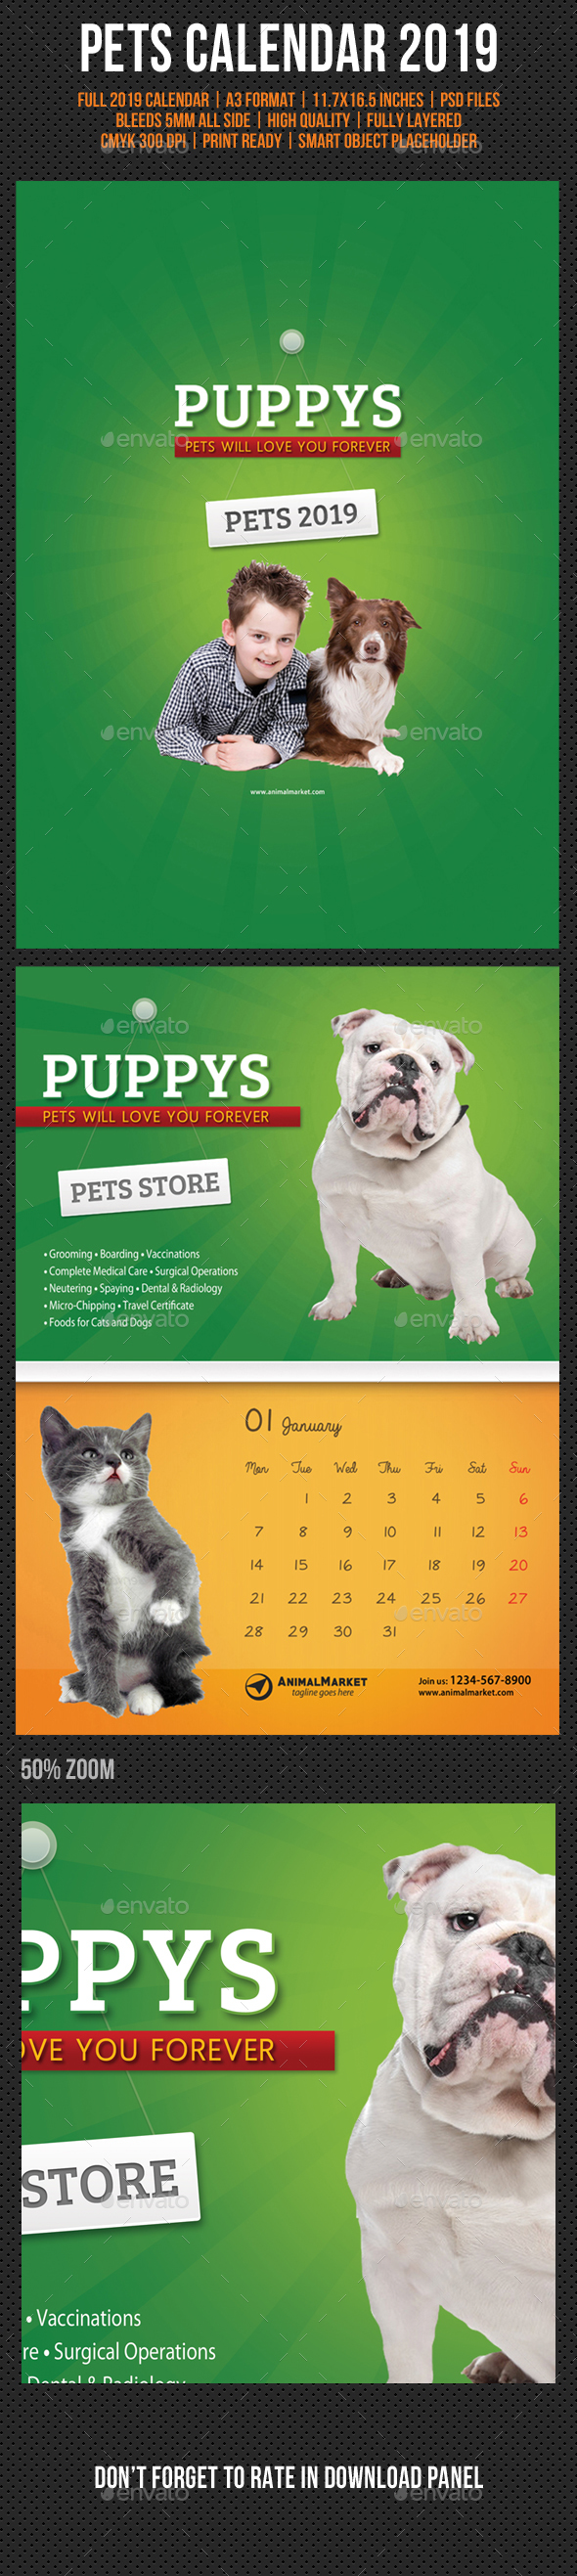 Pet Shop Wall Calendar 2019 - Calendars Stationery